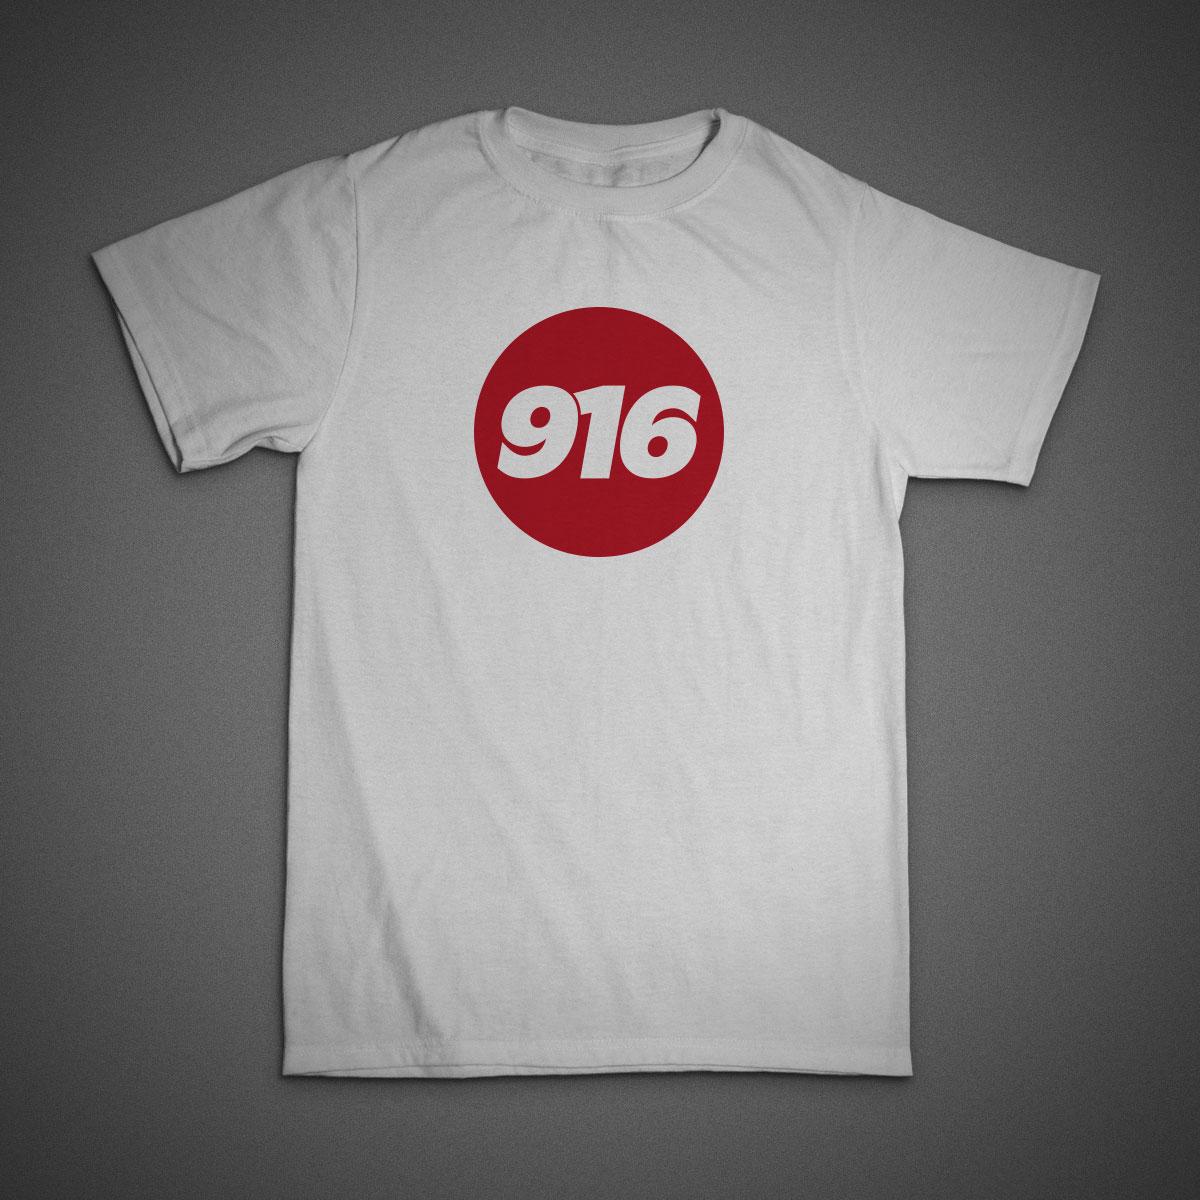 916-white-2